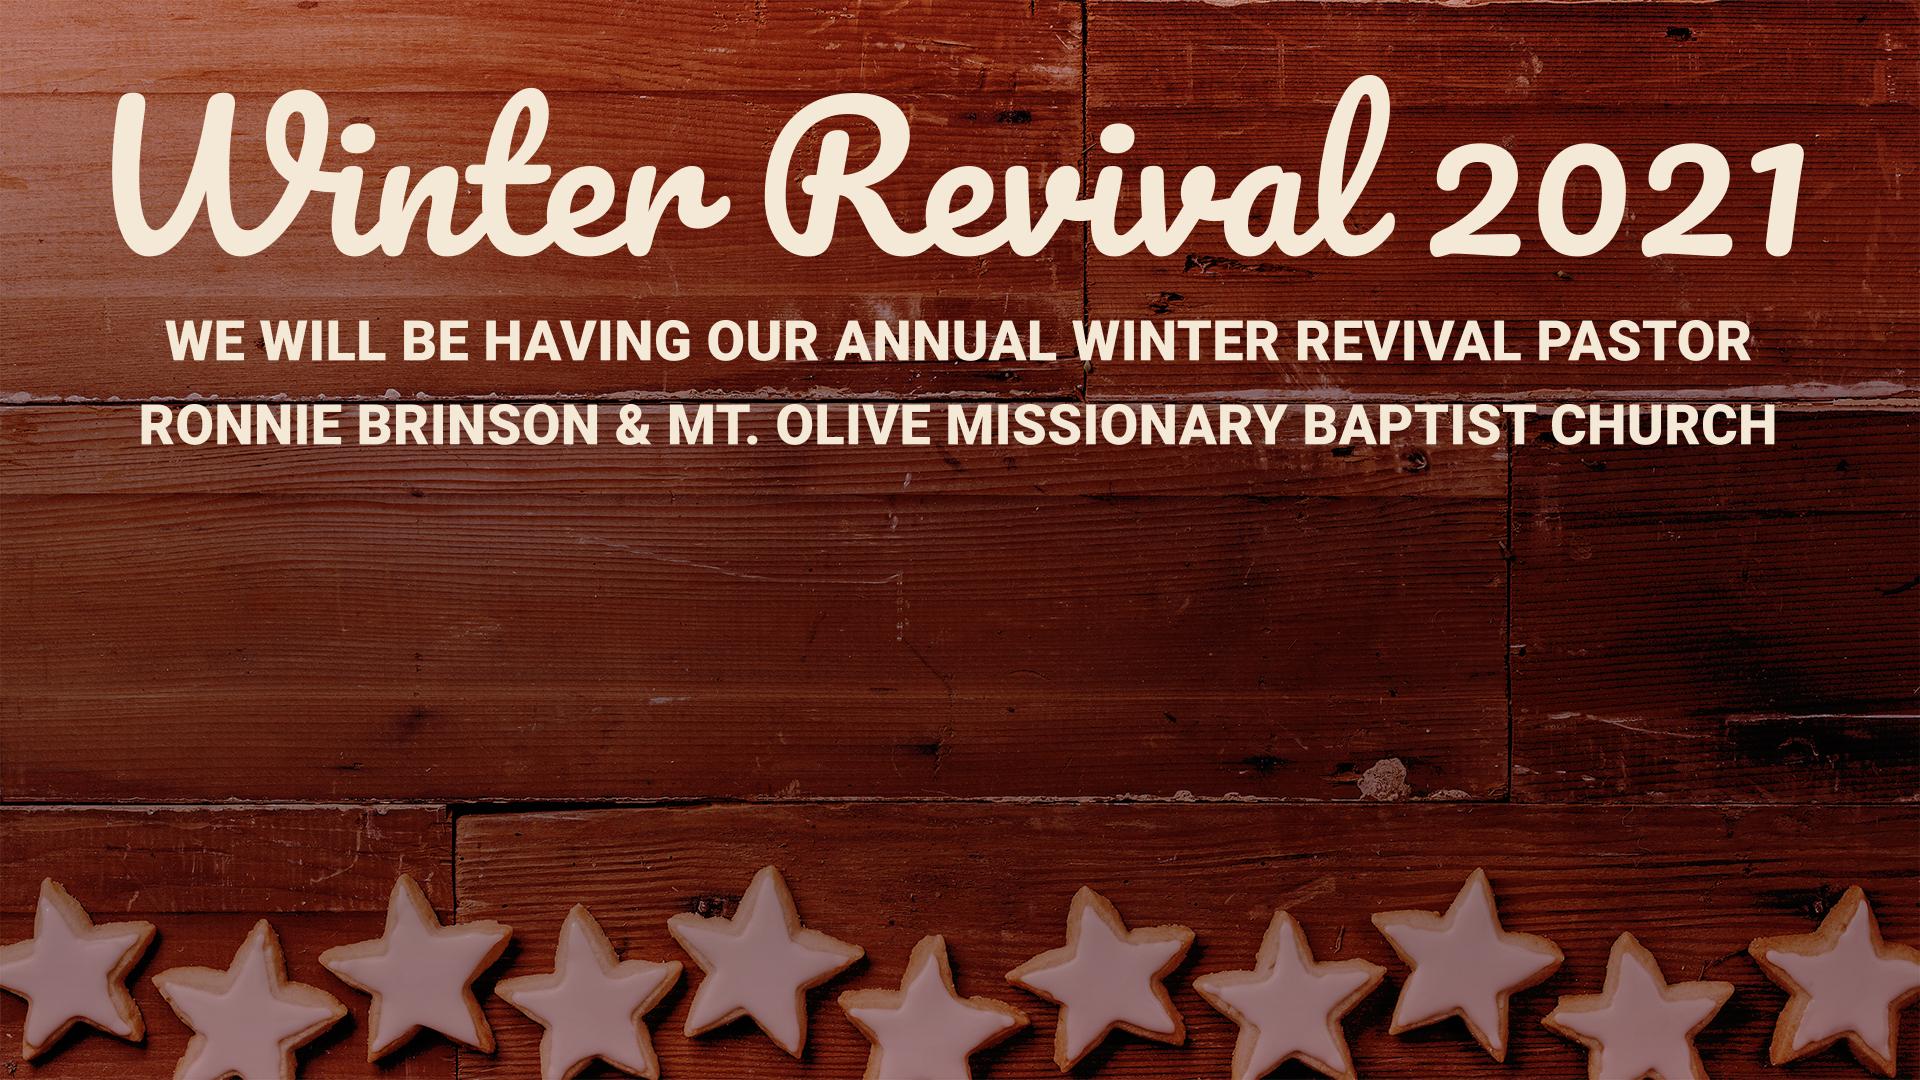 Winter Revival 2021